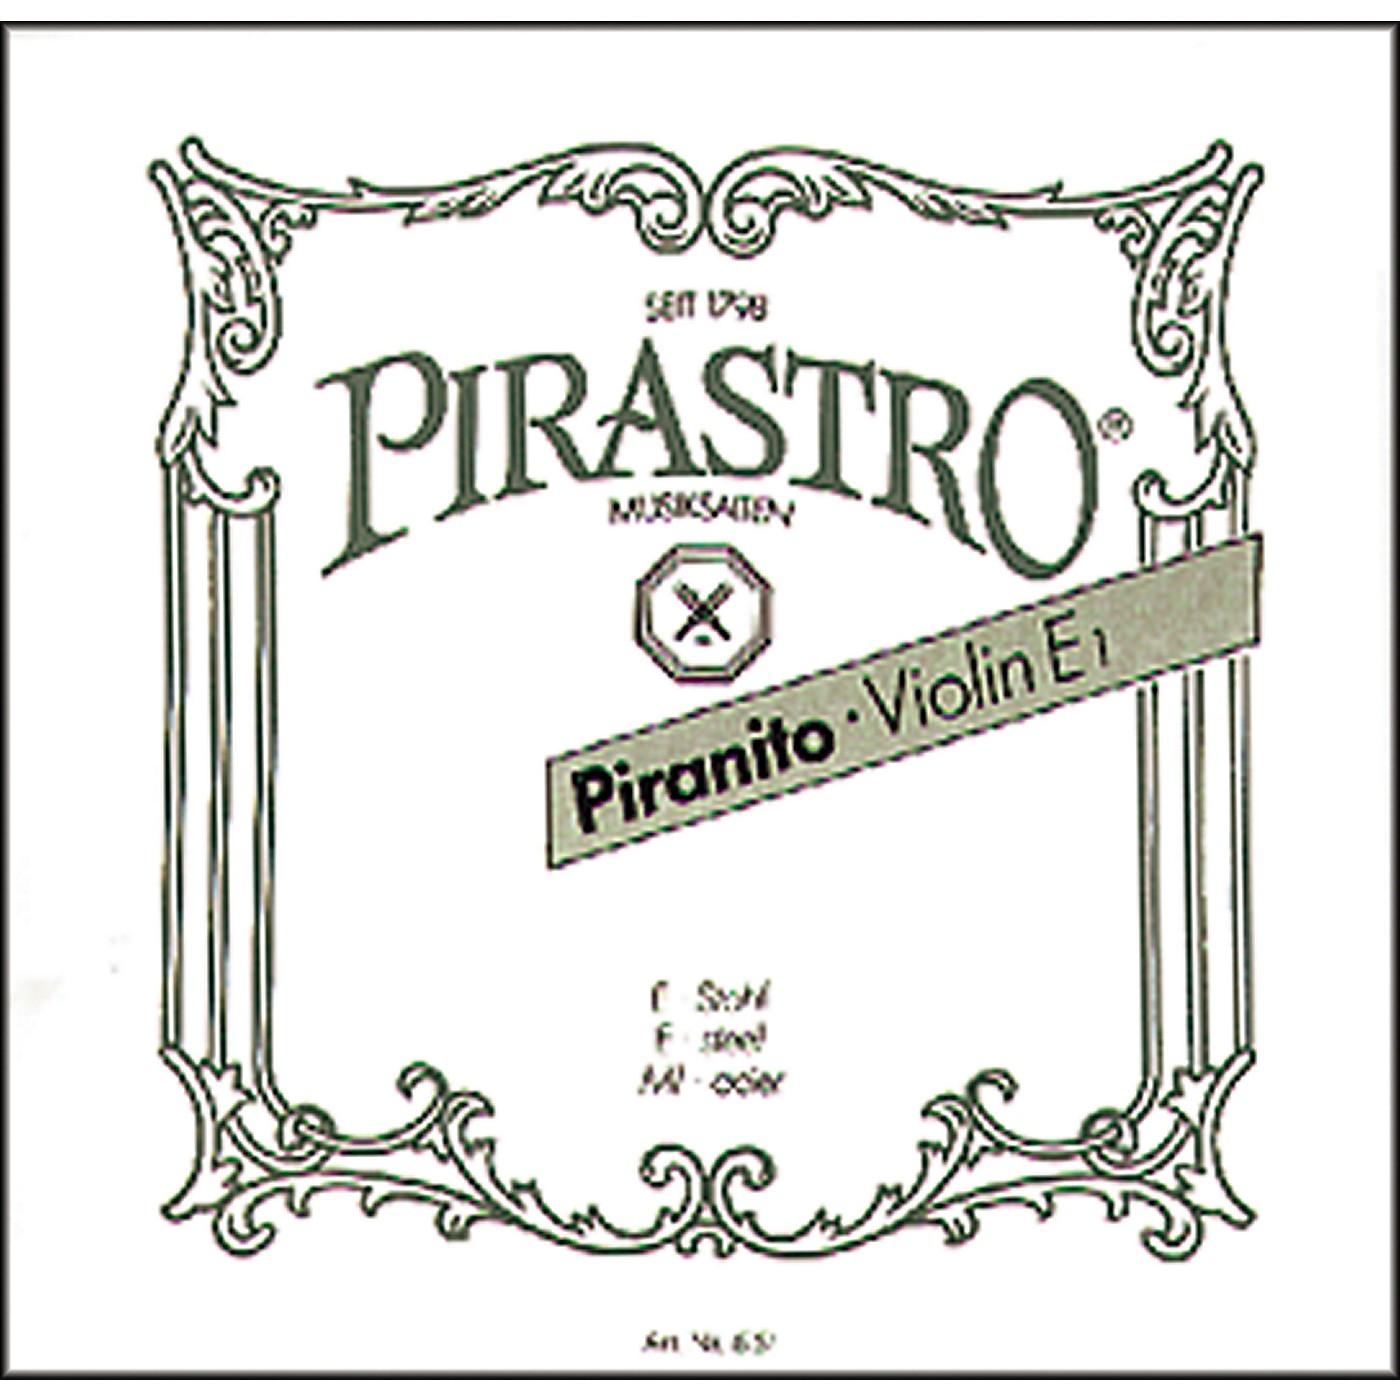 Pirastro Piranito Series Violin E String thumbnail